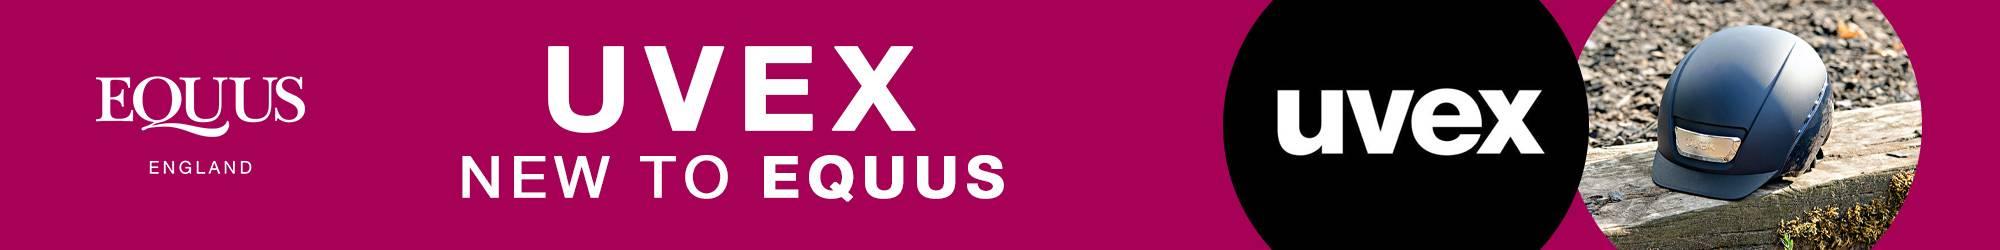 UVEX - New to EQUUS